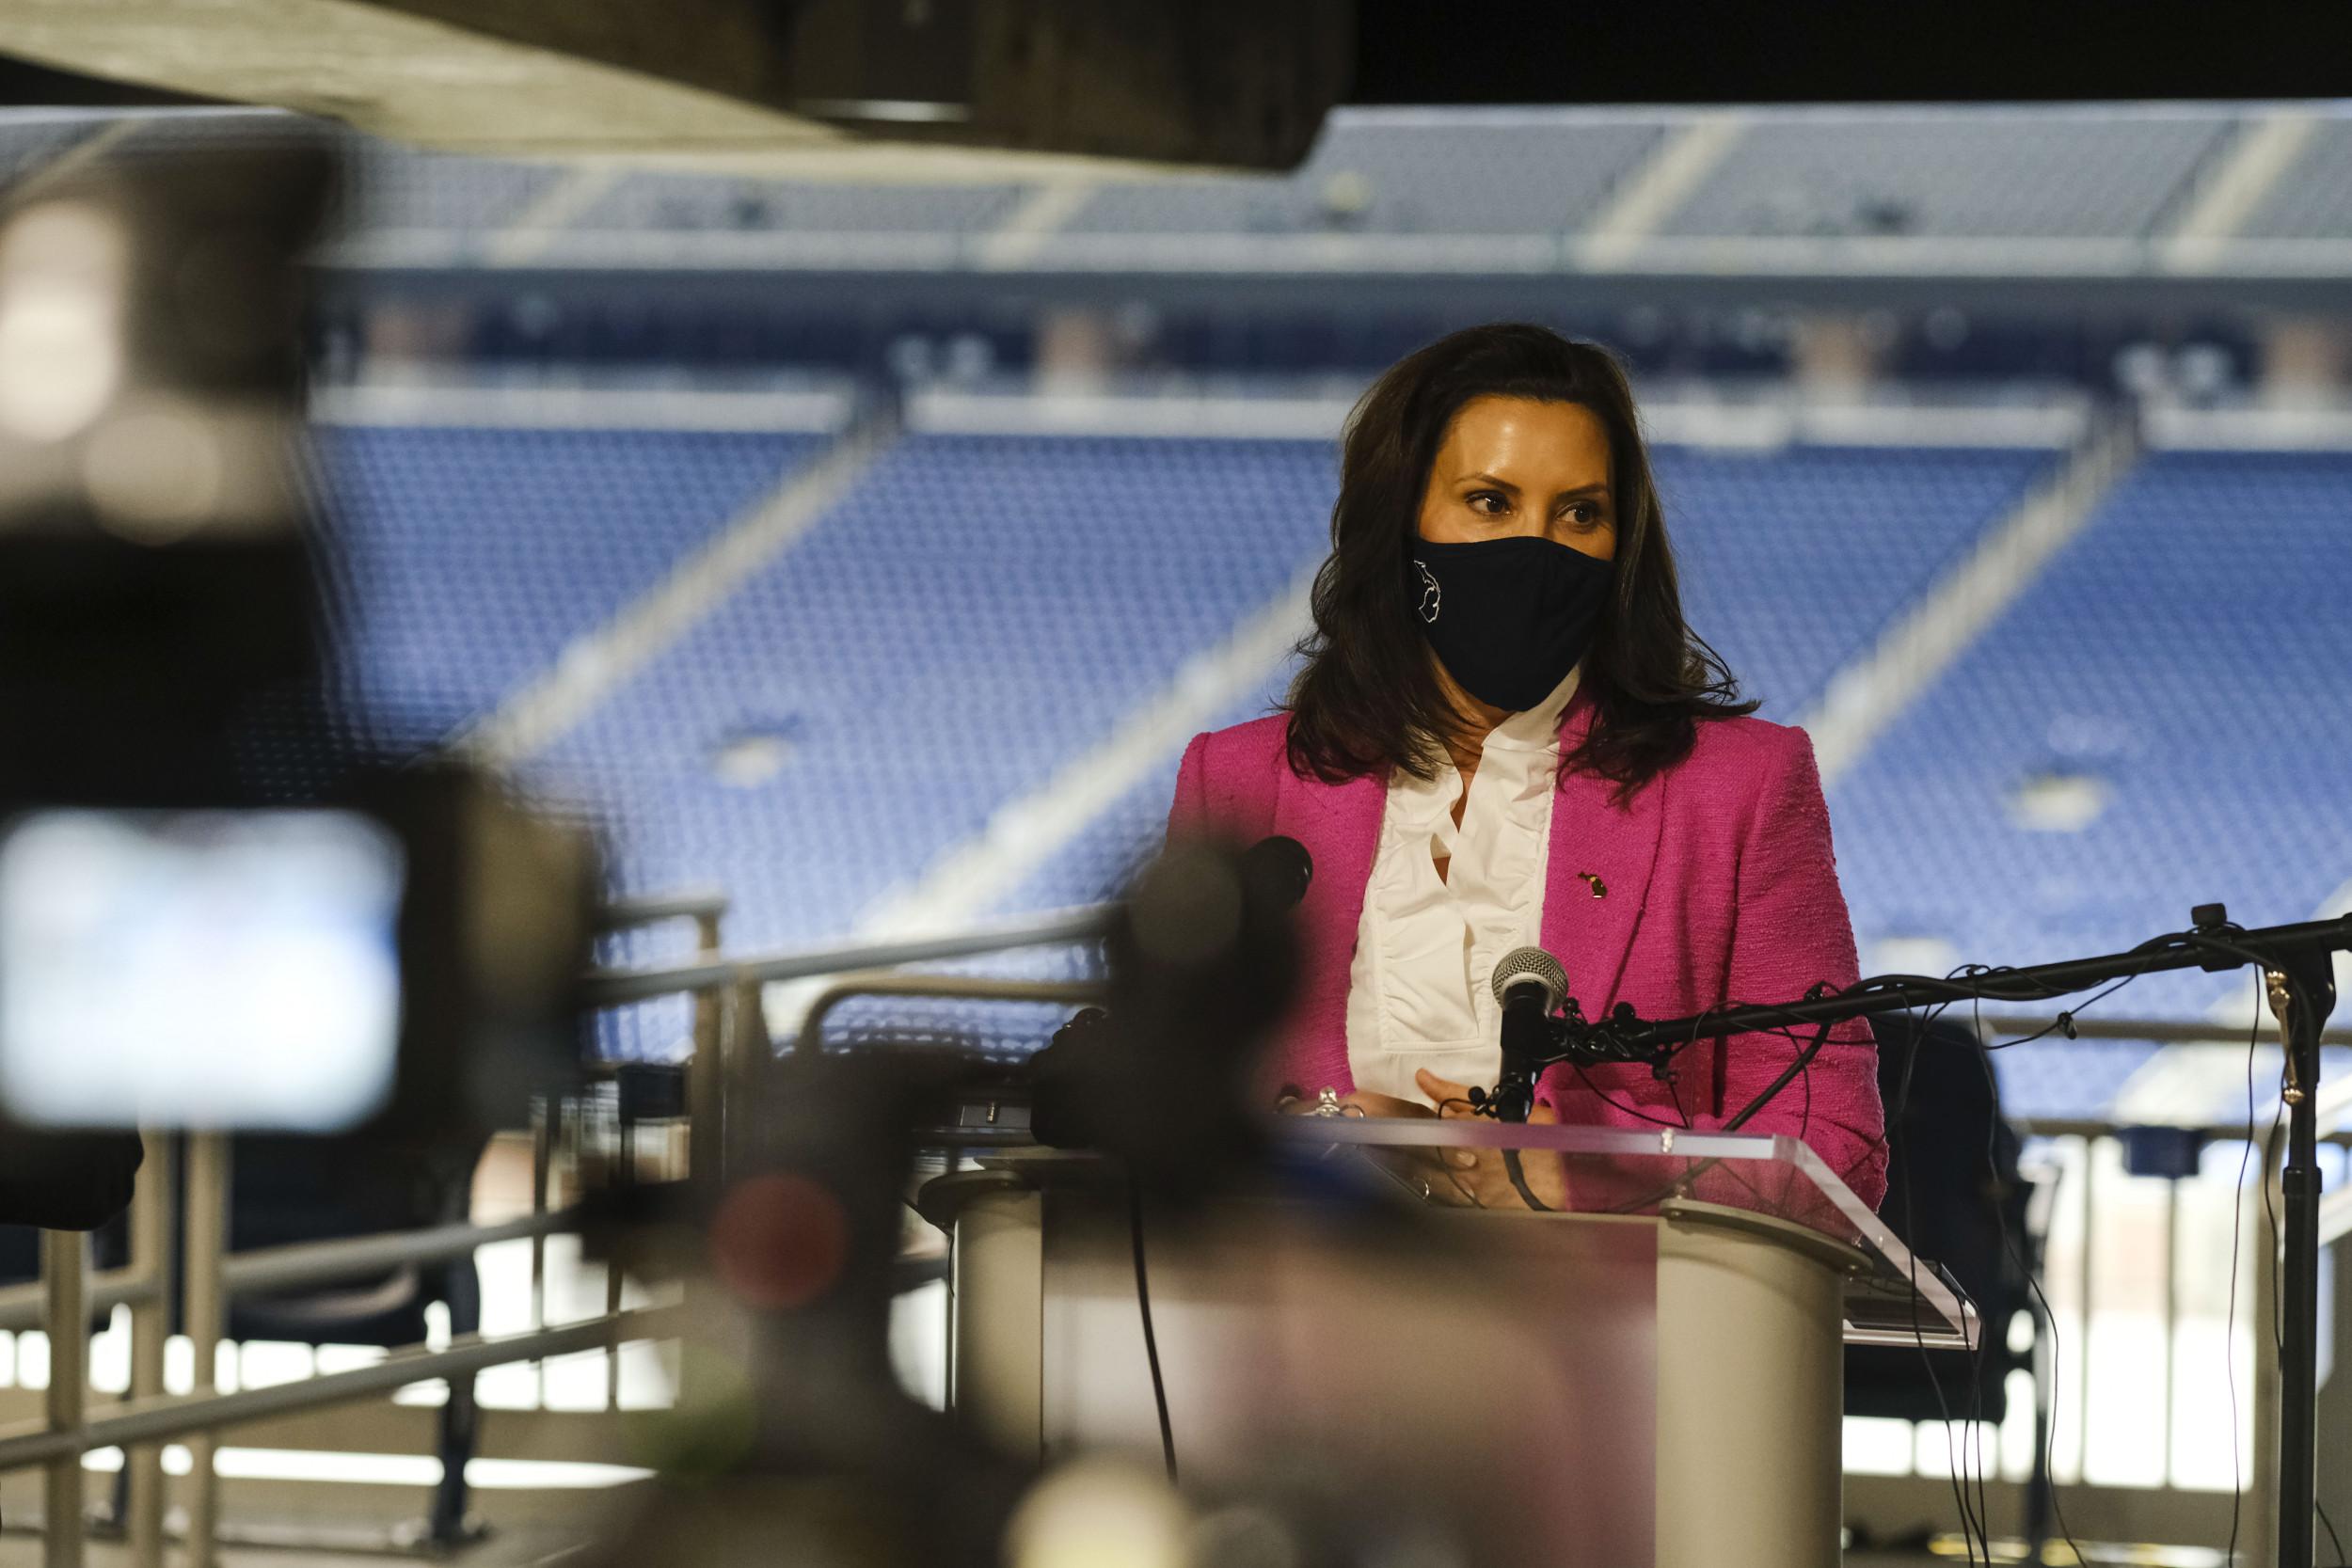 Michigan Gov. Whitmer Will Not Restart Mask Mandate Despite CDC Guidance